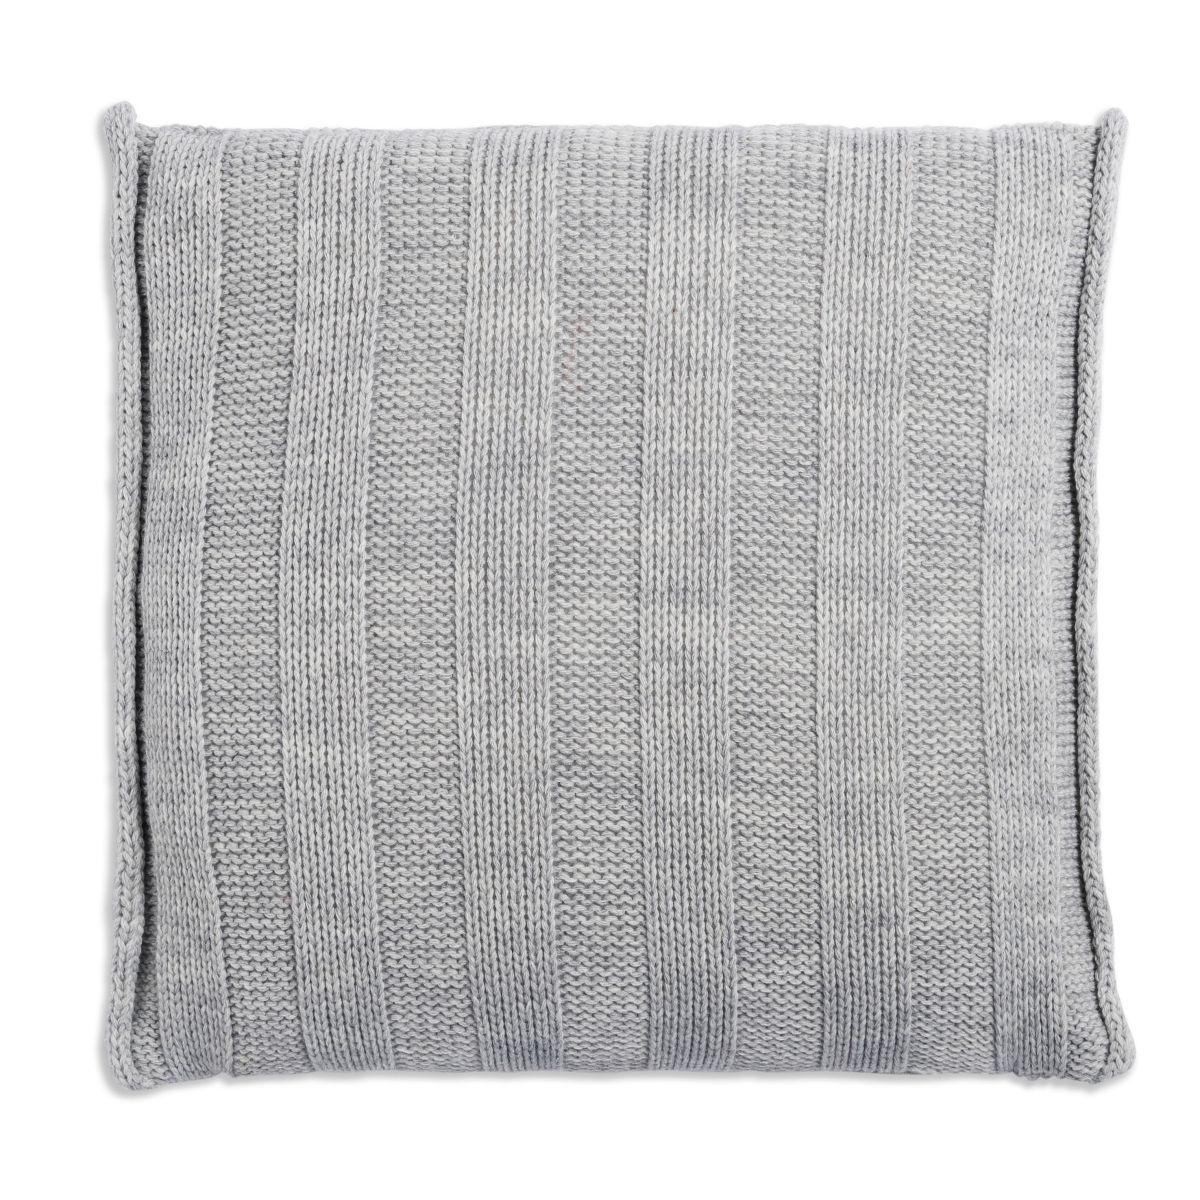 knit factory 1091211 kussen 50x50 jesse licht grijs2